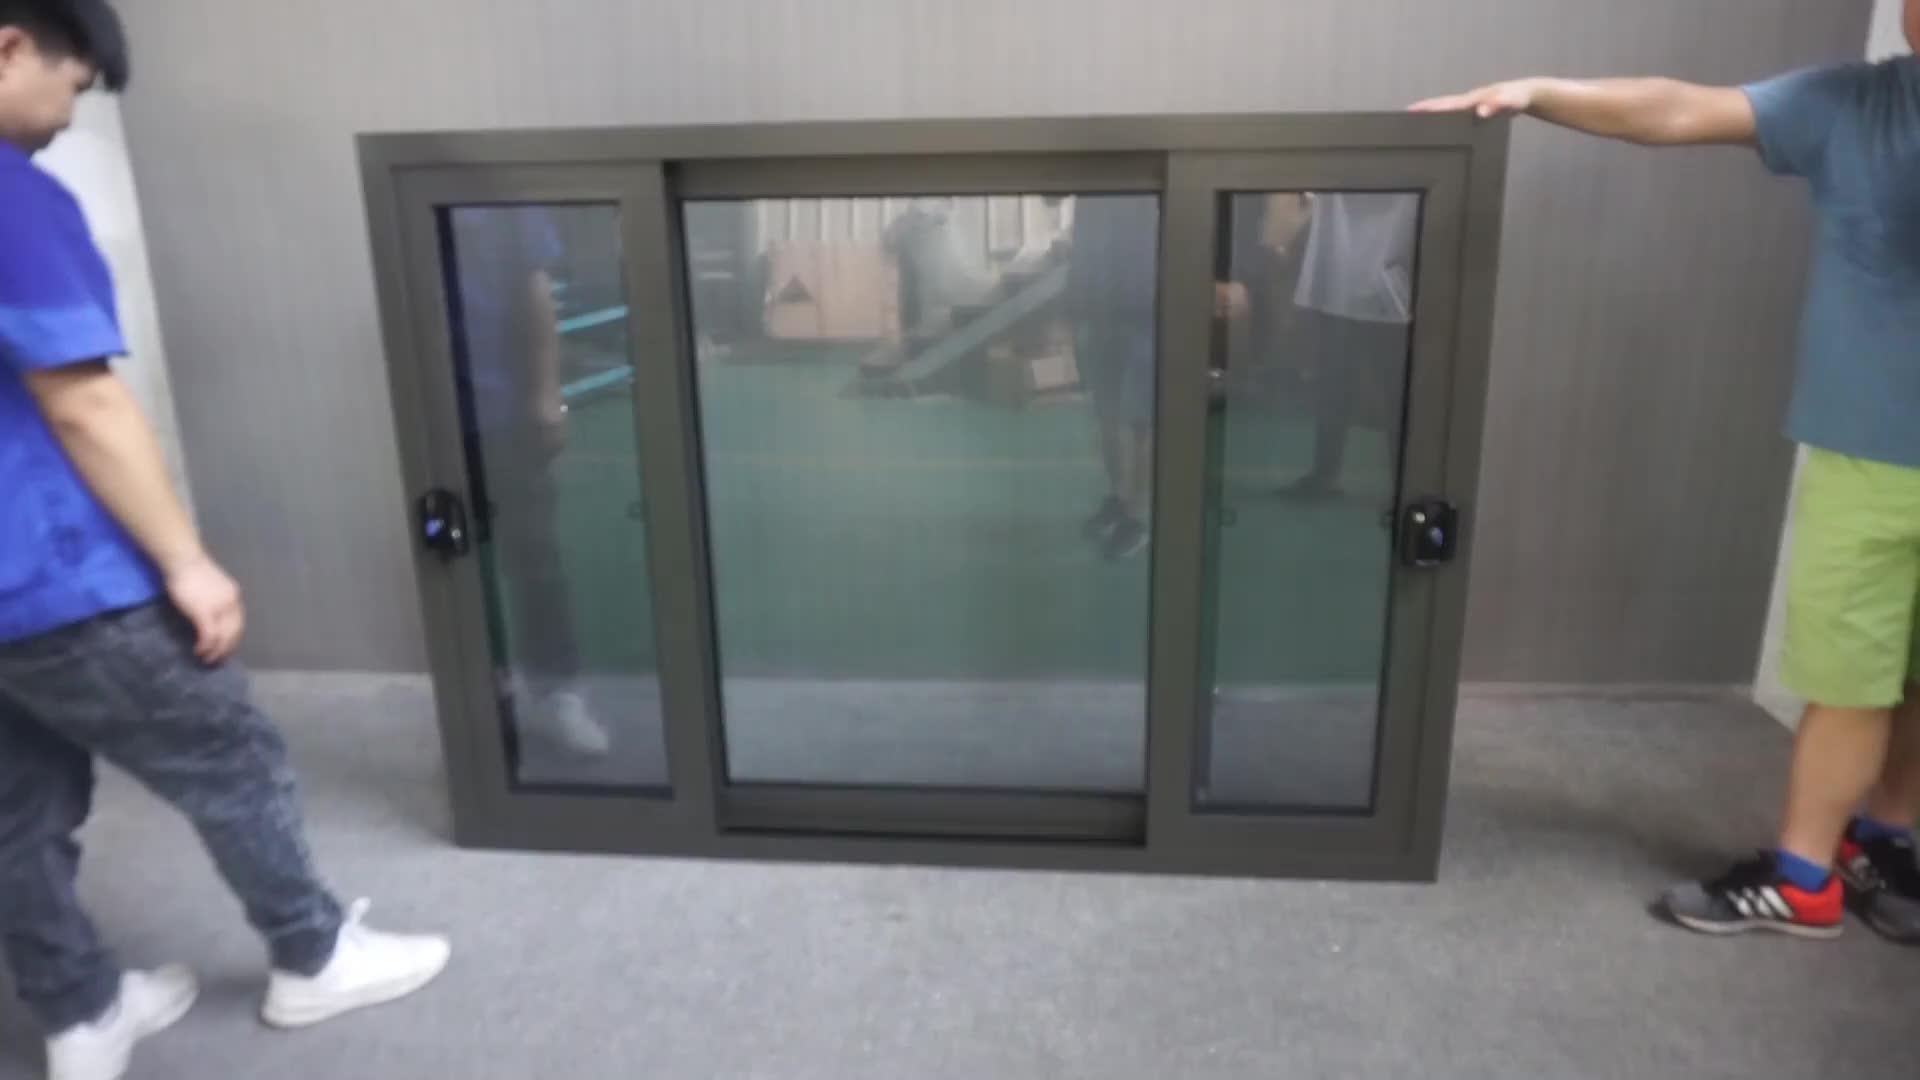 NZS4211 Customized Size Modern Australian Standard Aluminum Frame Double Glass Sliding Windows With Roto Lock